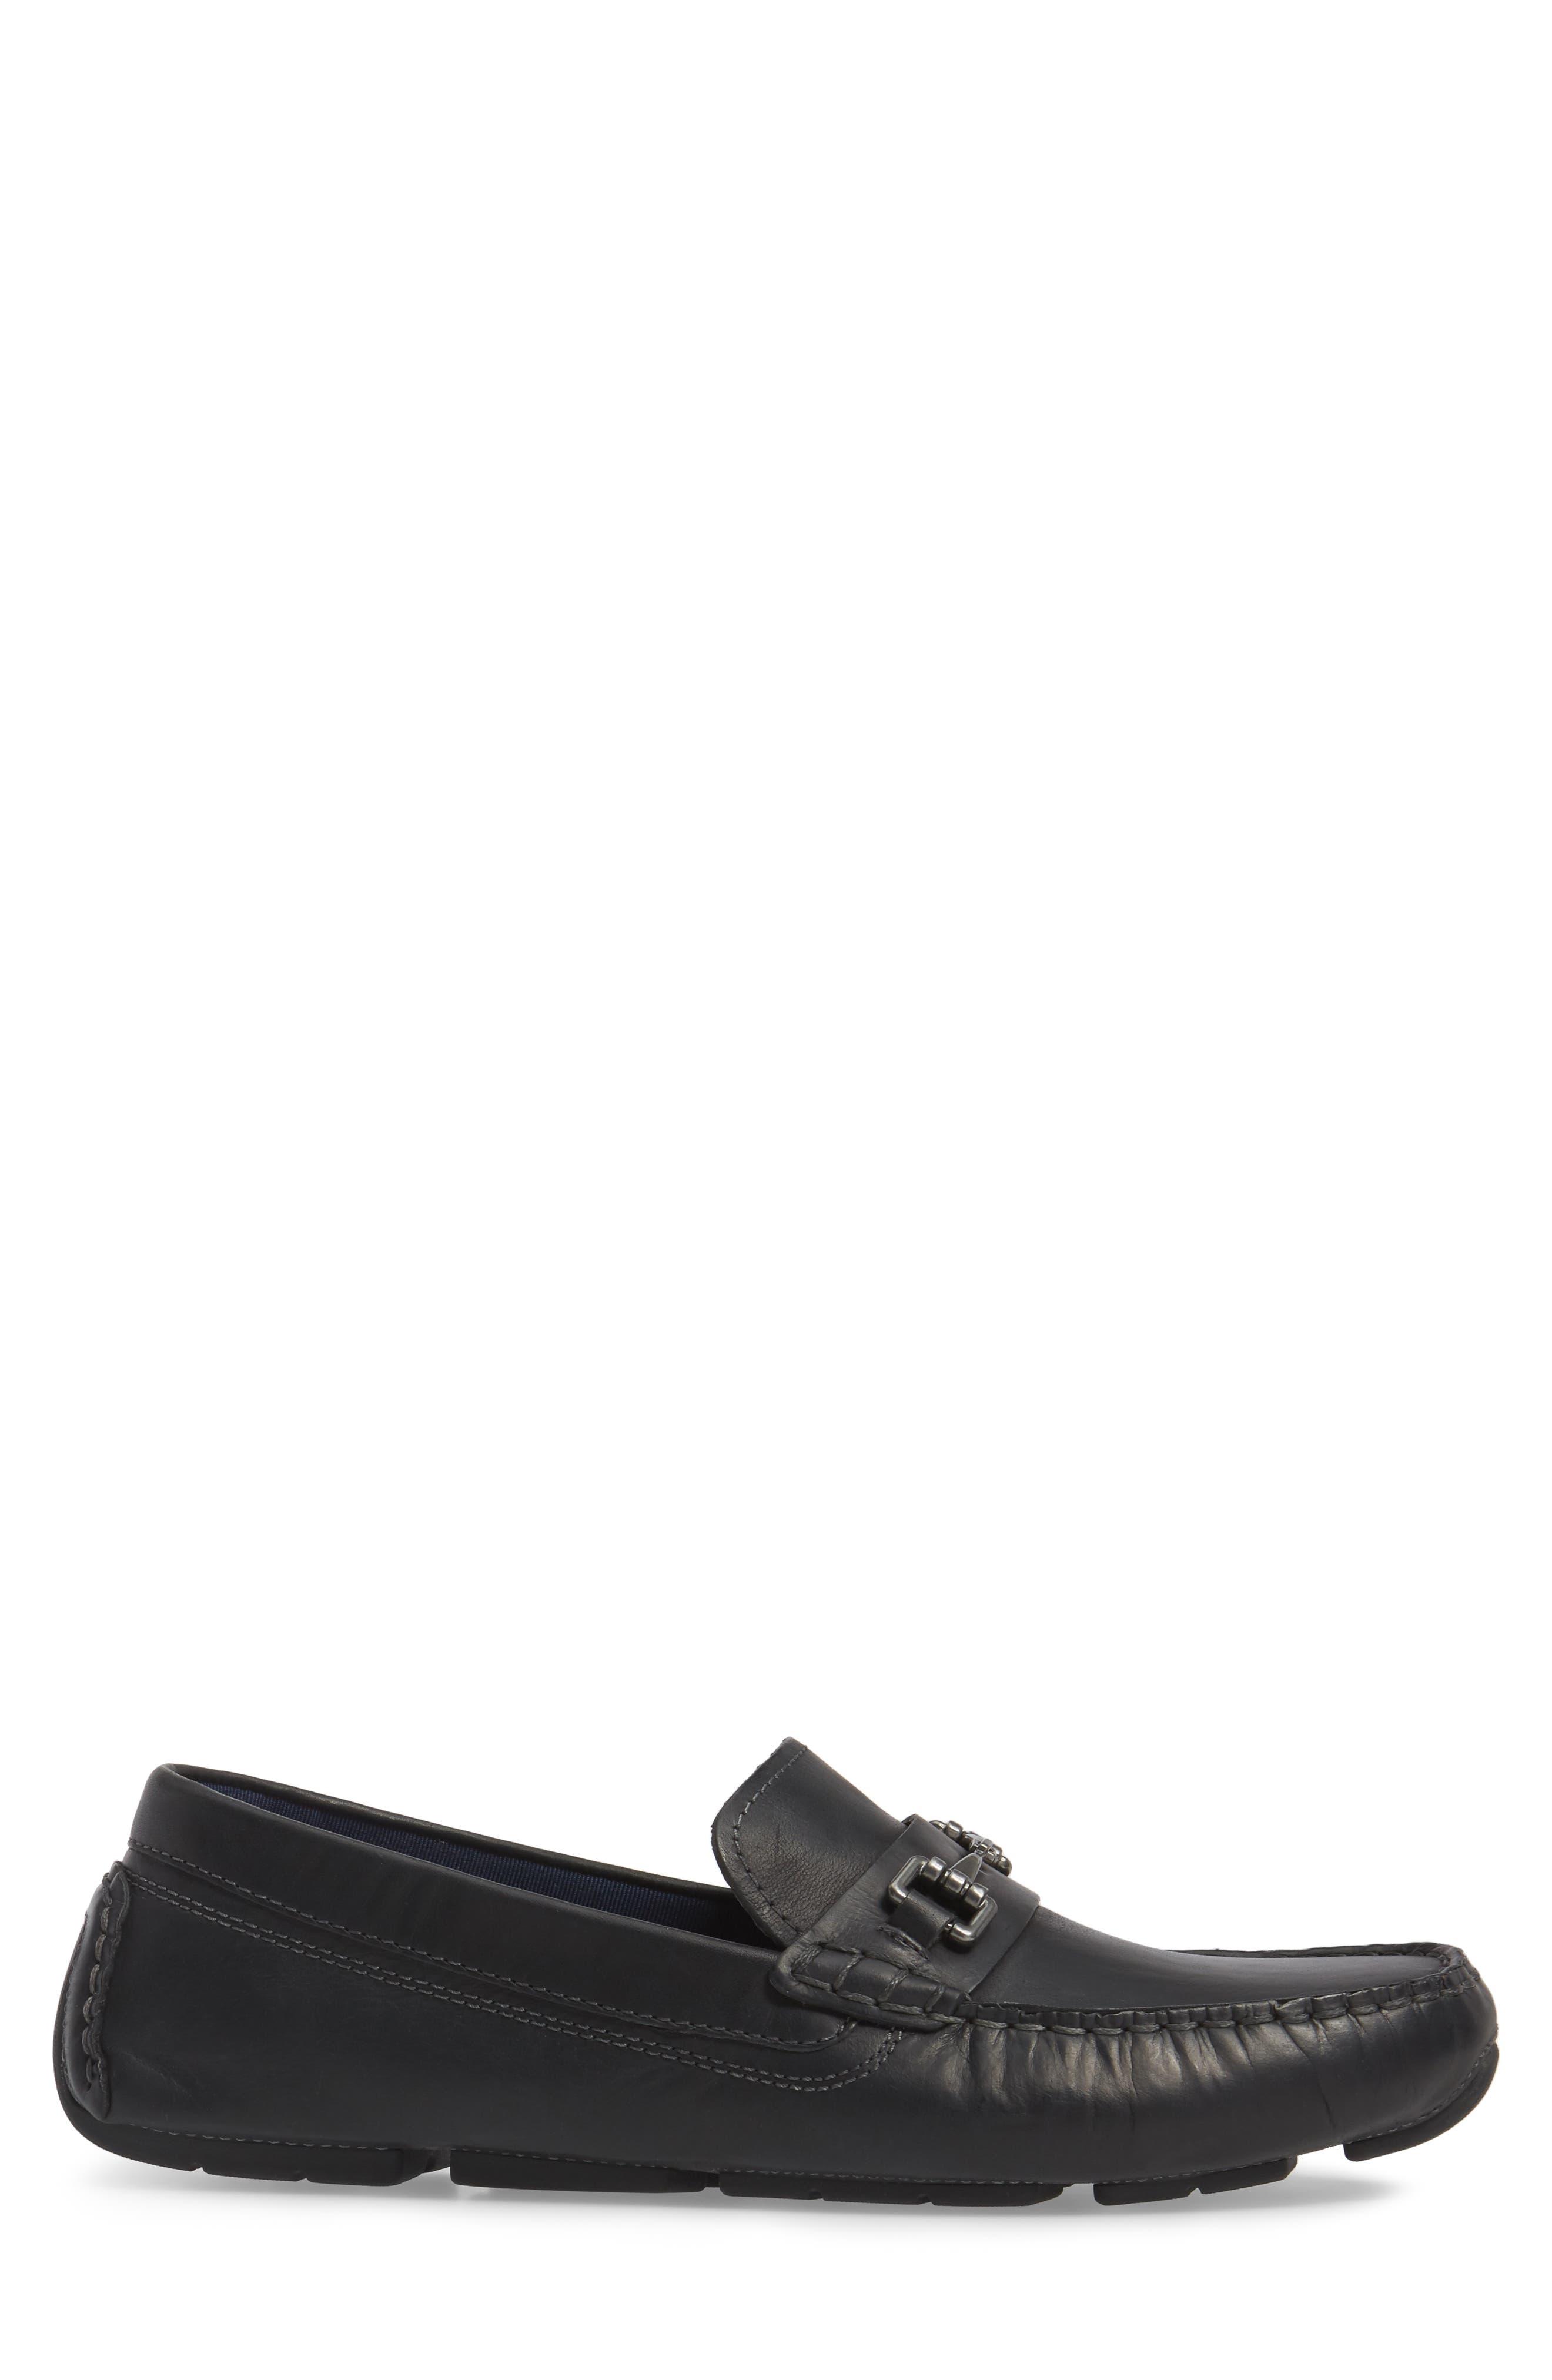 Kelson Bit Driving Shoe,                             Alternate thumbnail 3, color,                             Black Leather